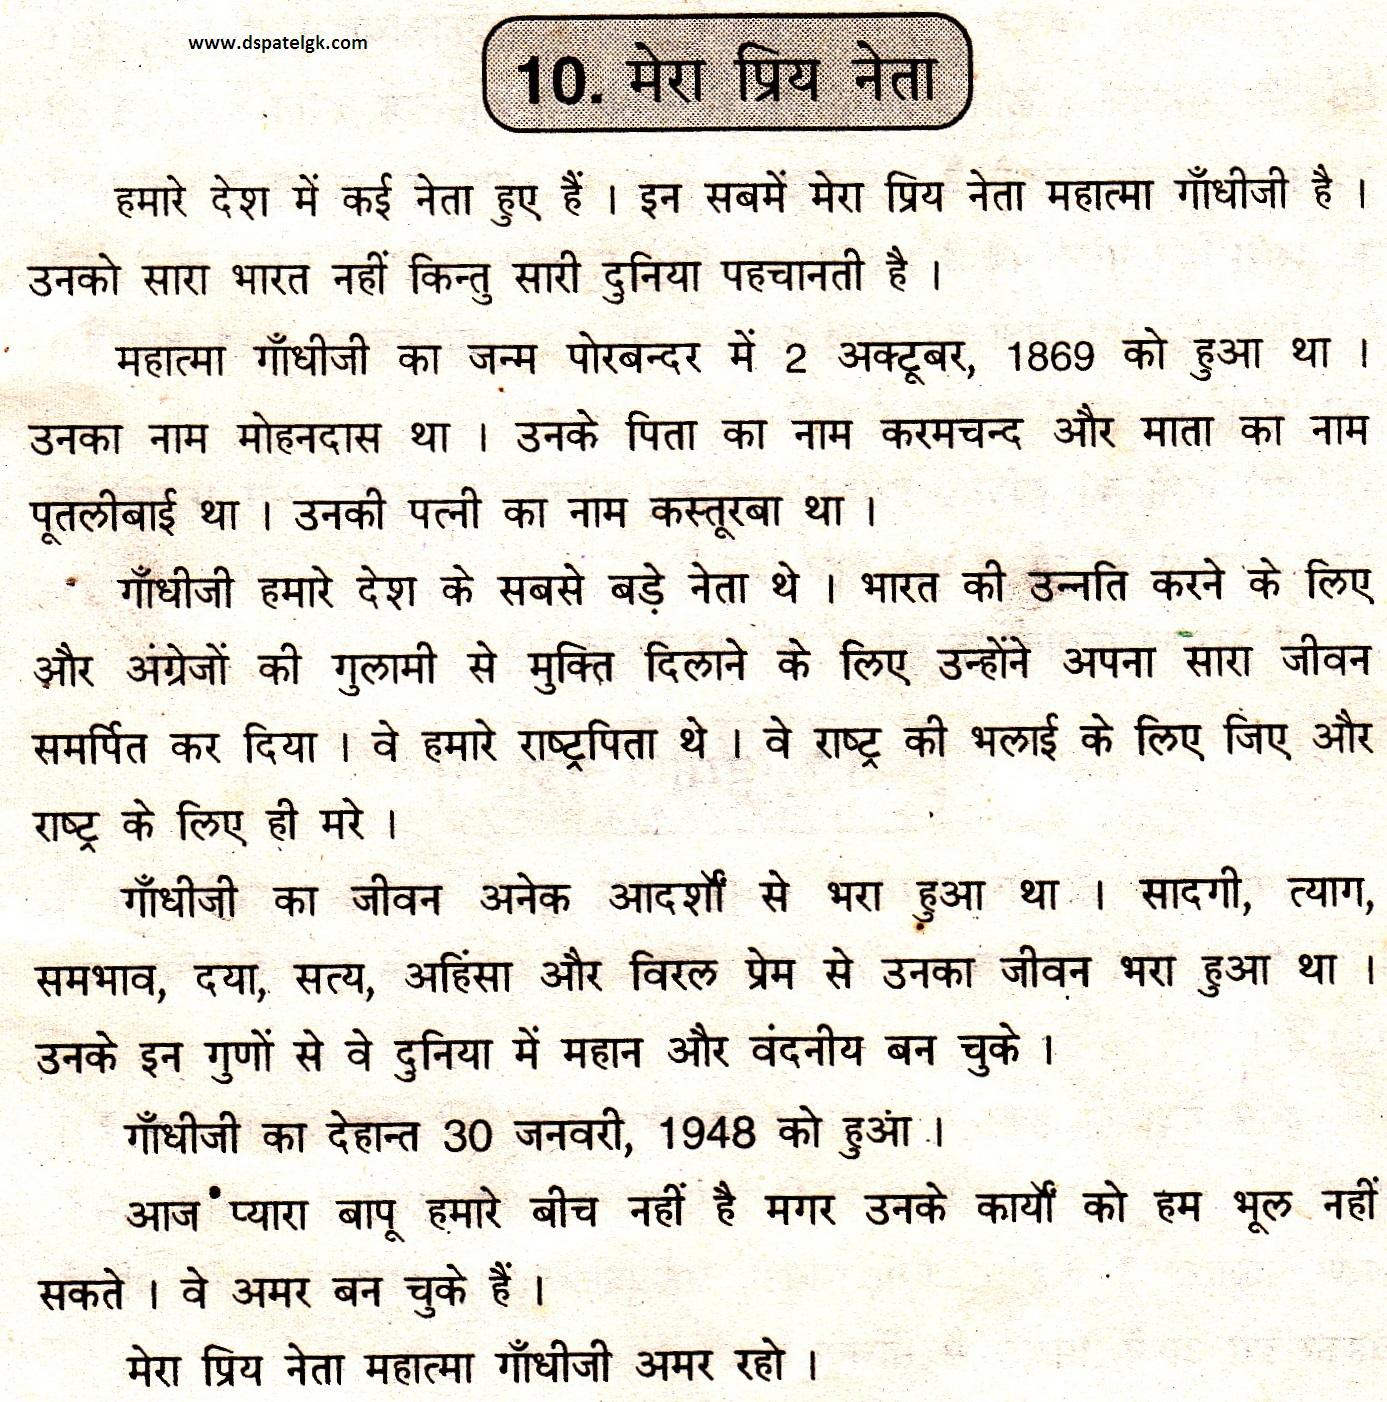 mera priy khel nibandh in hindi March 30, 2015 hindiessayin123topic: mera priya khel essay in hindi – 743877 –priya–khel–essaymera priya khel essay in hindi.